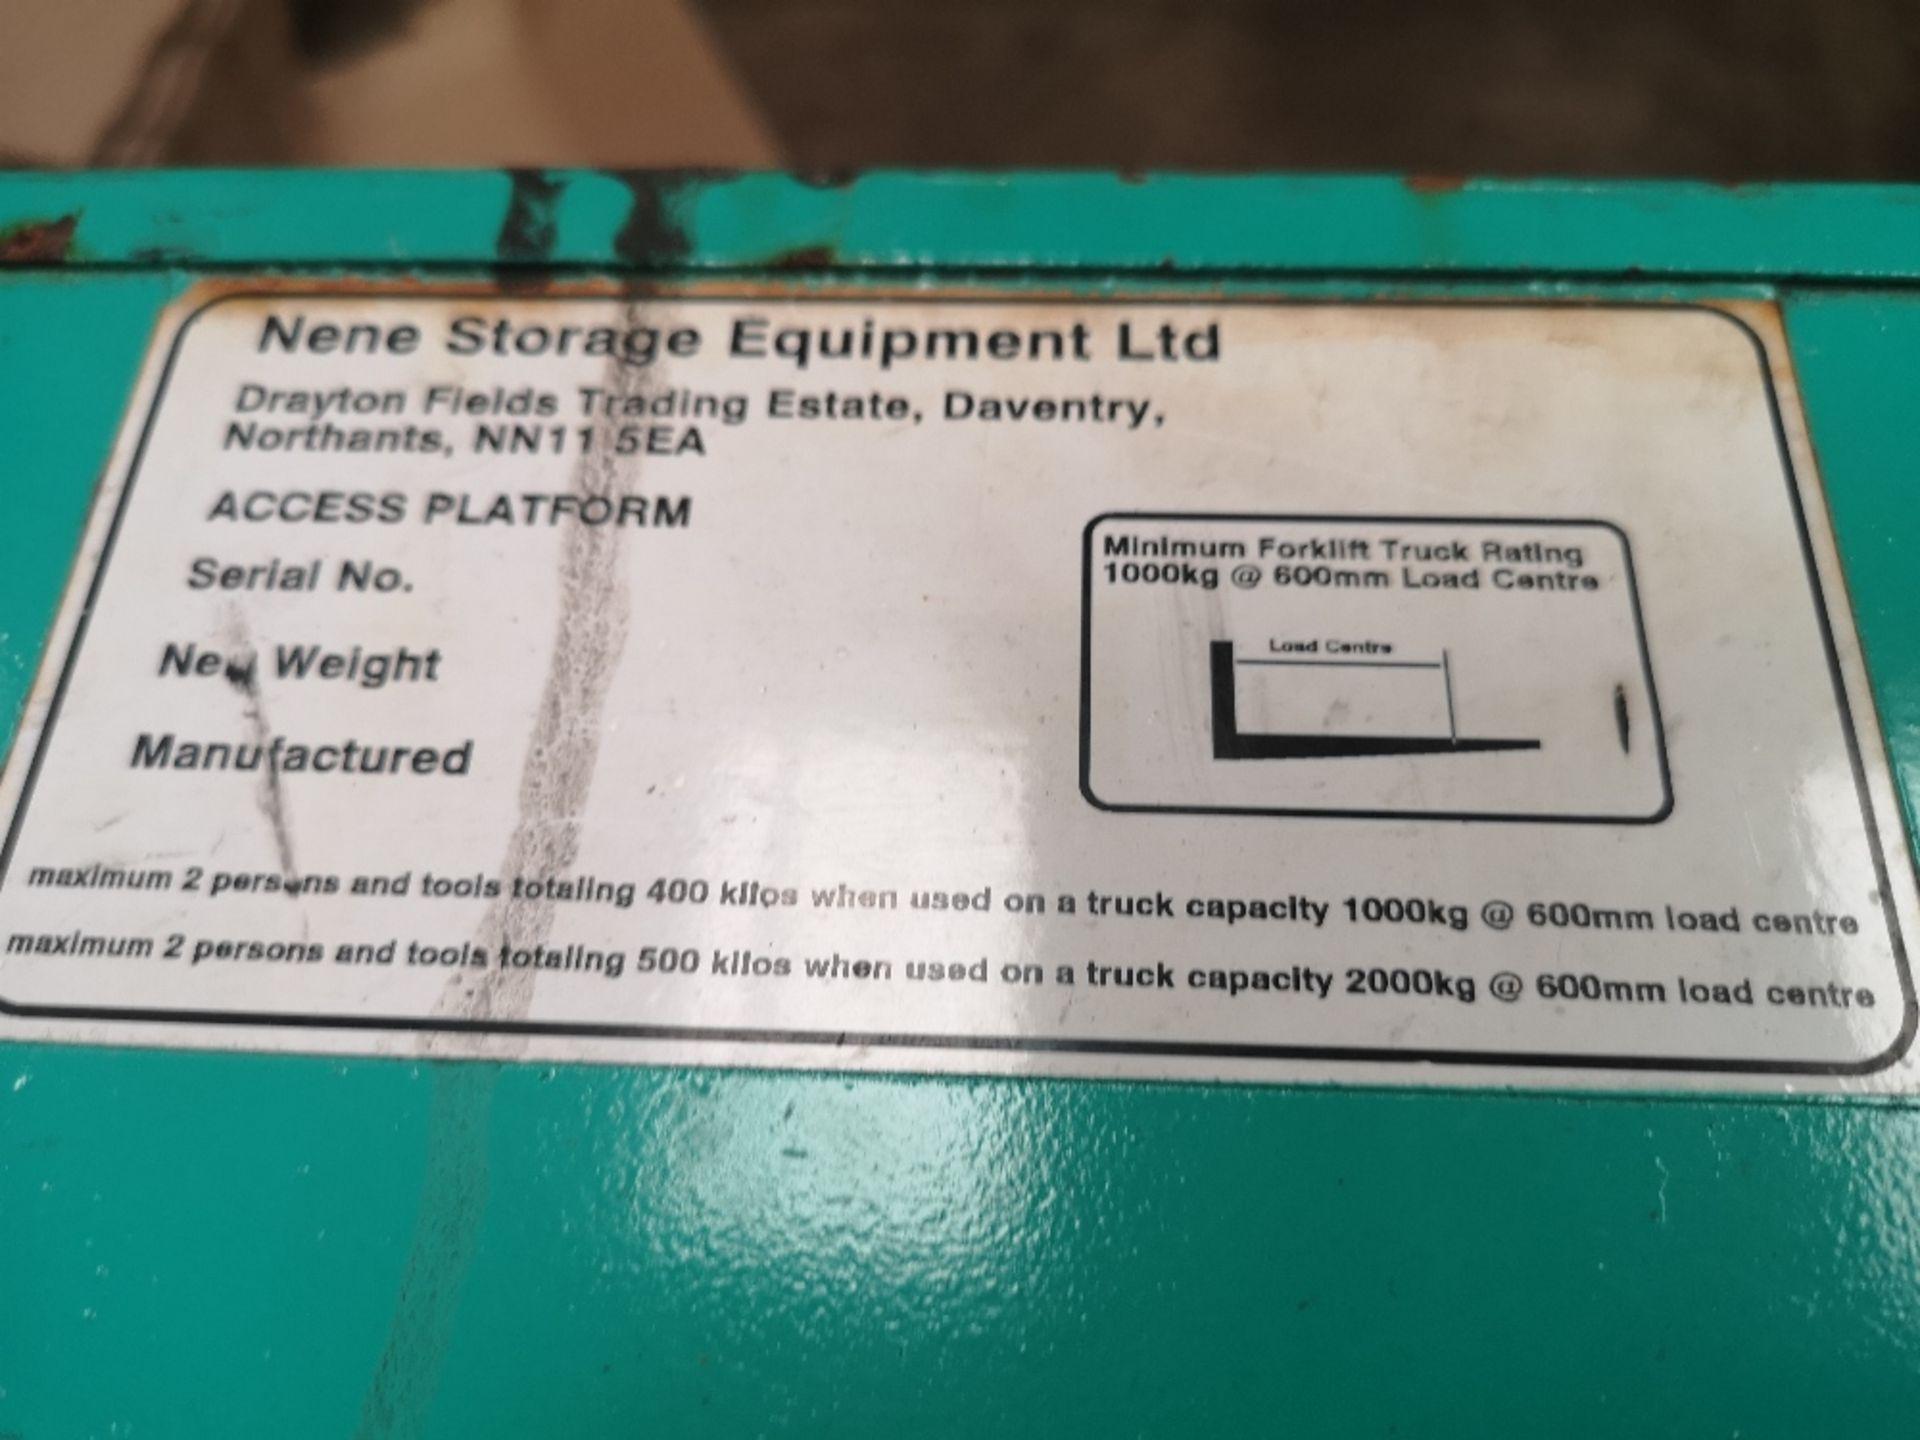 Nene Storage Equipment Steel Forklift Access Platform - Image 2 of 2